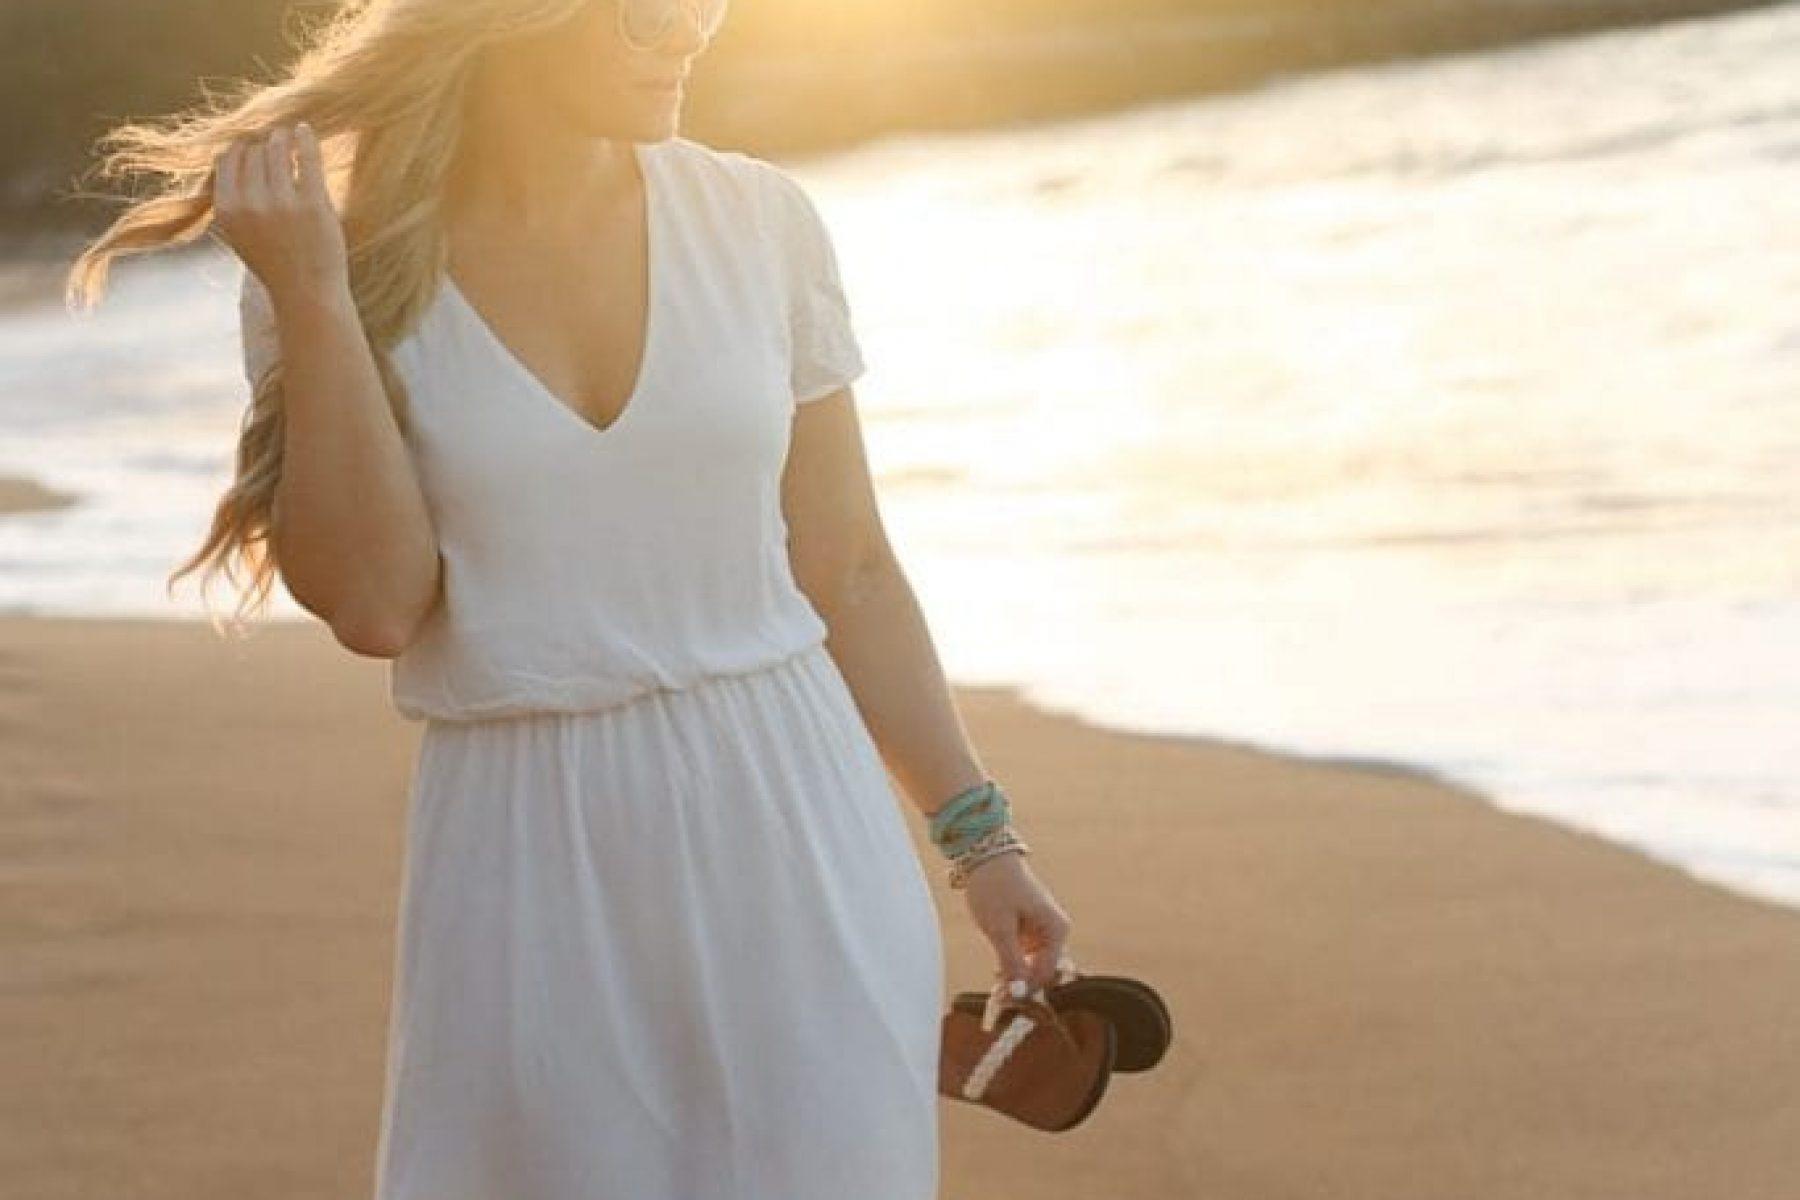 Wayf-Summer Dress-Beach-Hair-Maui-Vacation-Travel-Hawaii-Blogger-7